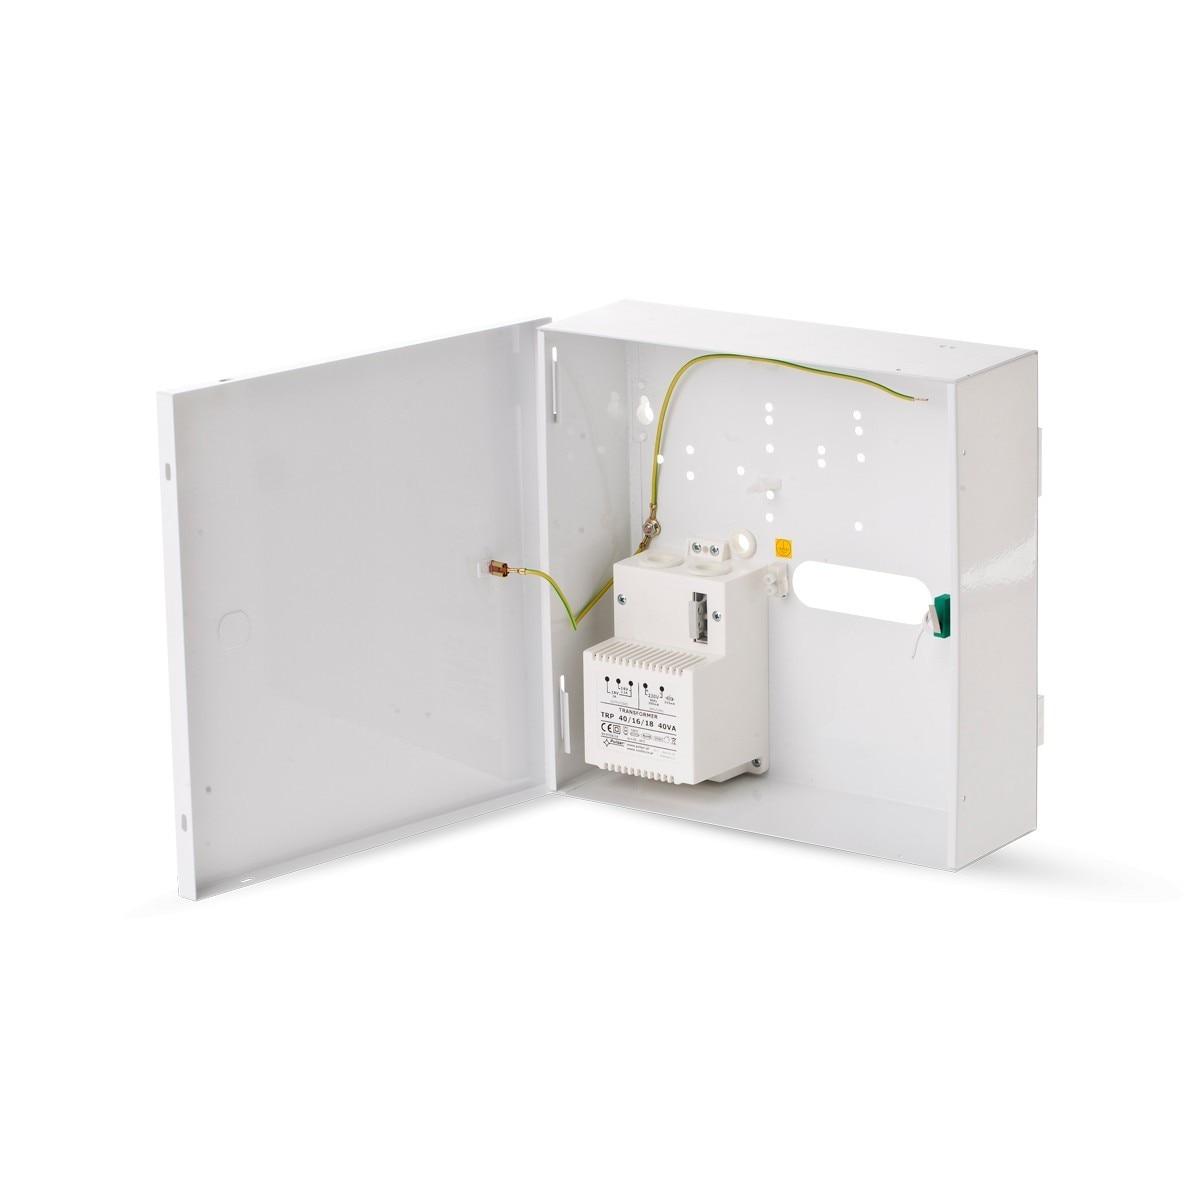 Metal Cash Box From Surface For Original Electronics Alarma ESIM364 ELDES